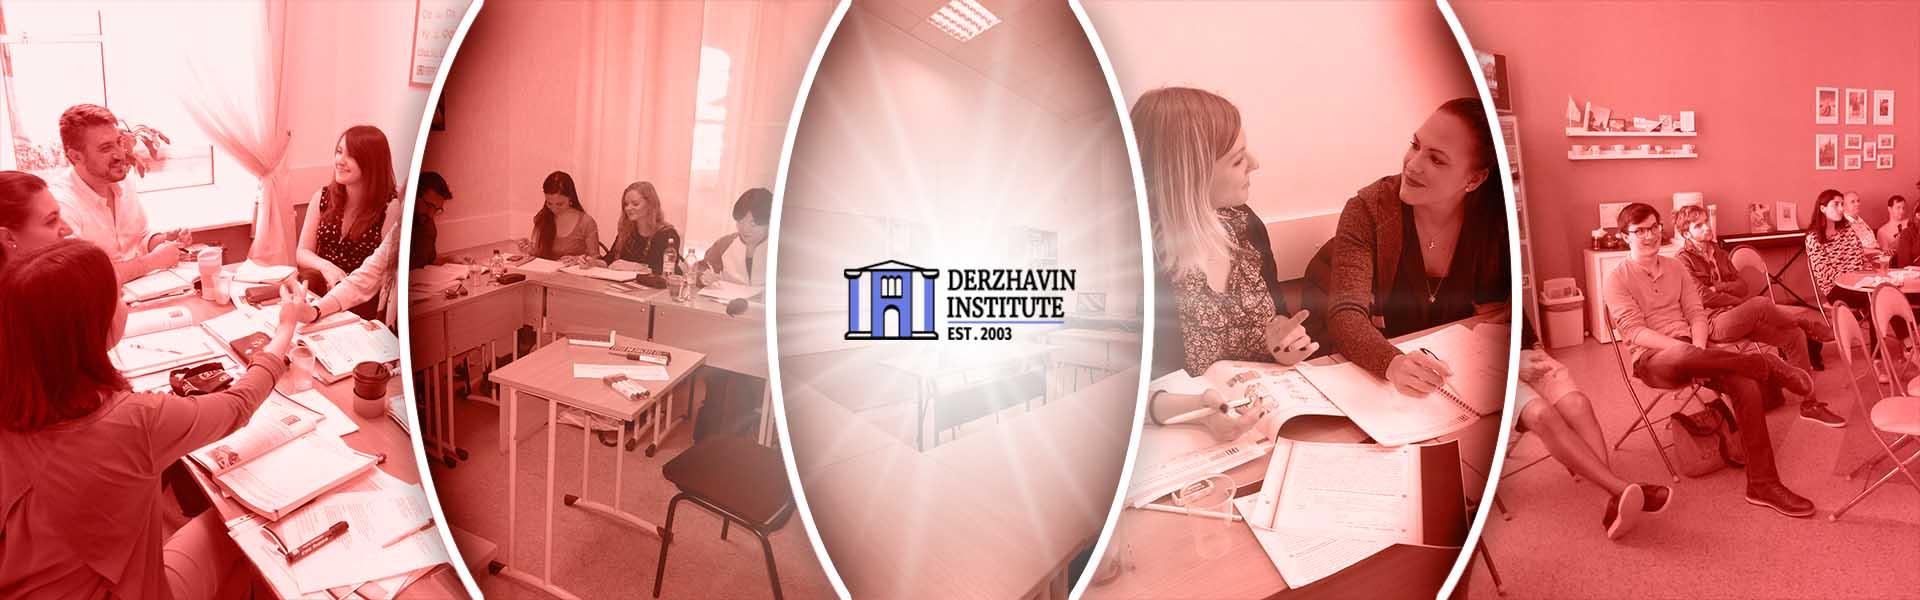 Derzhavin Institut St. Petersburg Dil Okulu